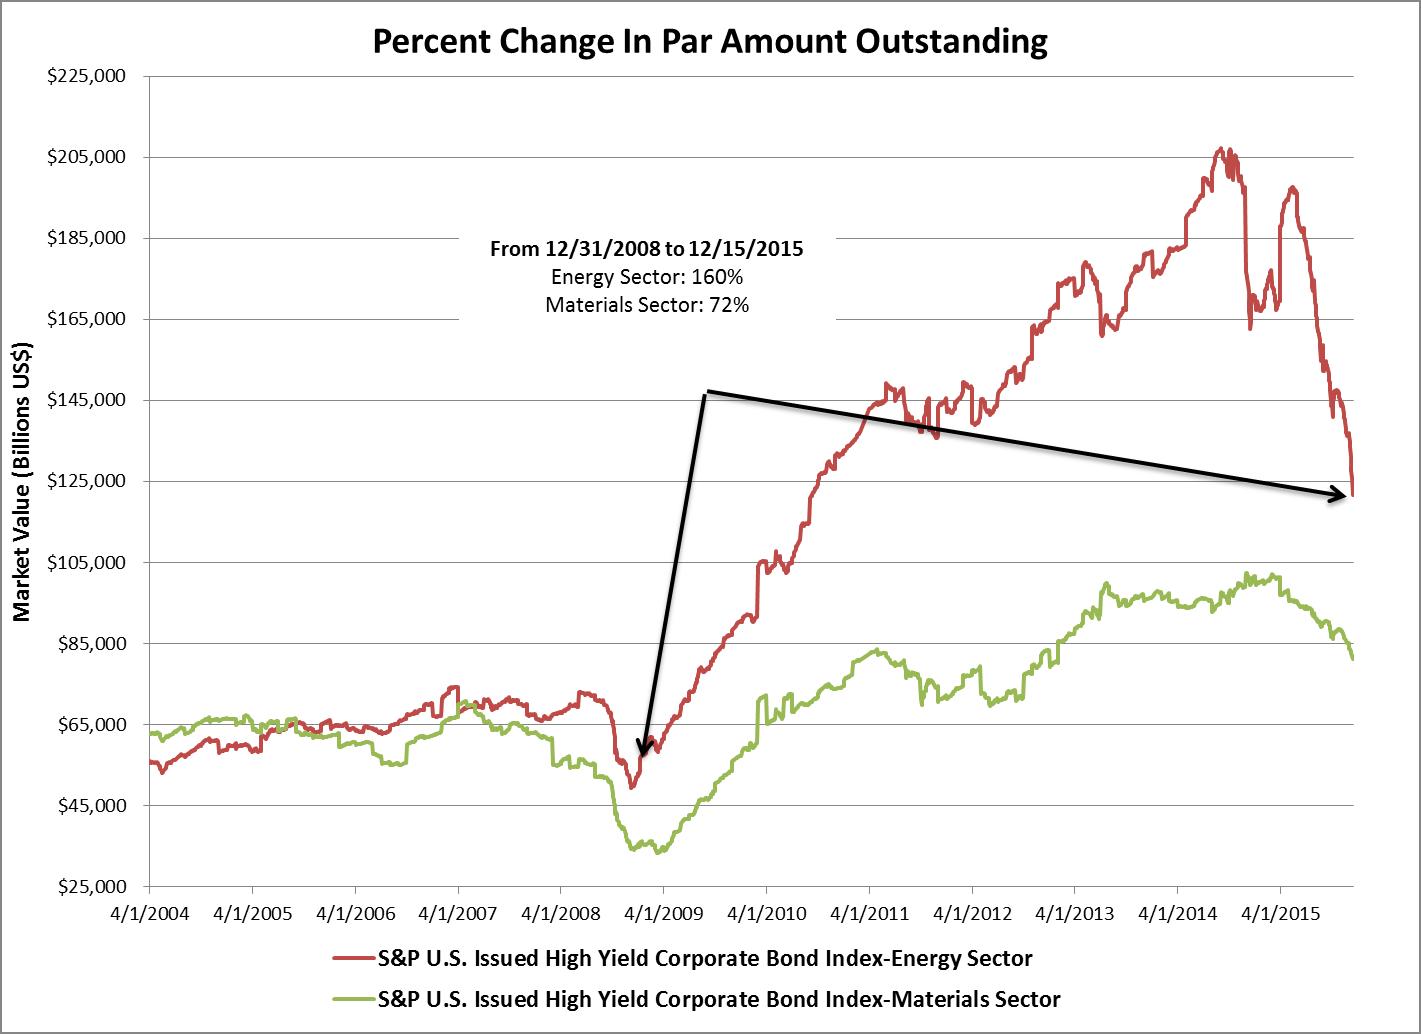 Percent Change in Par Amount Outstanding